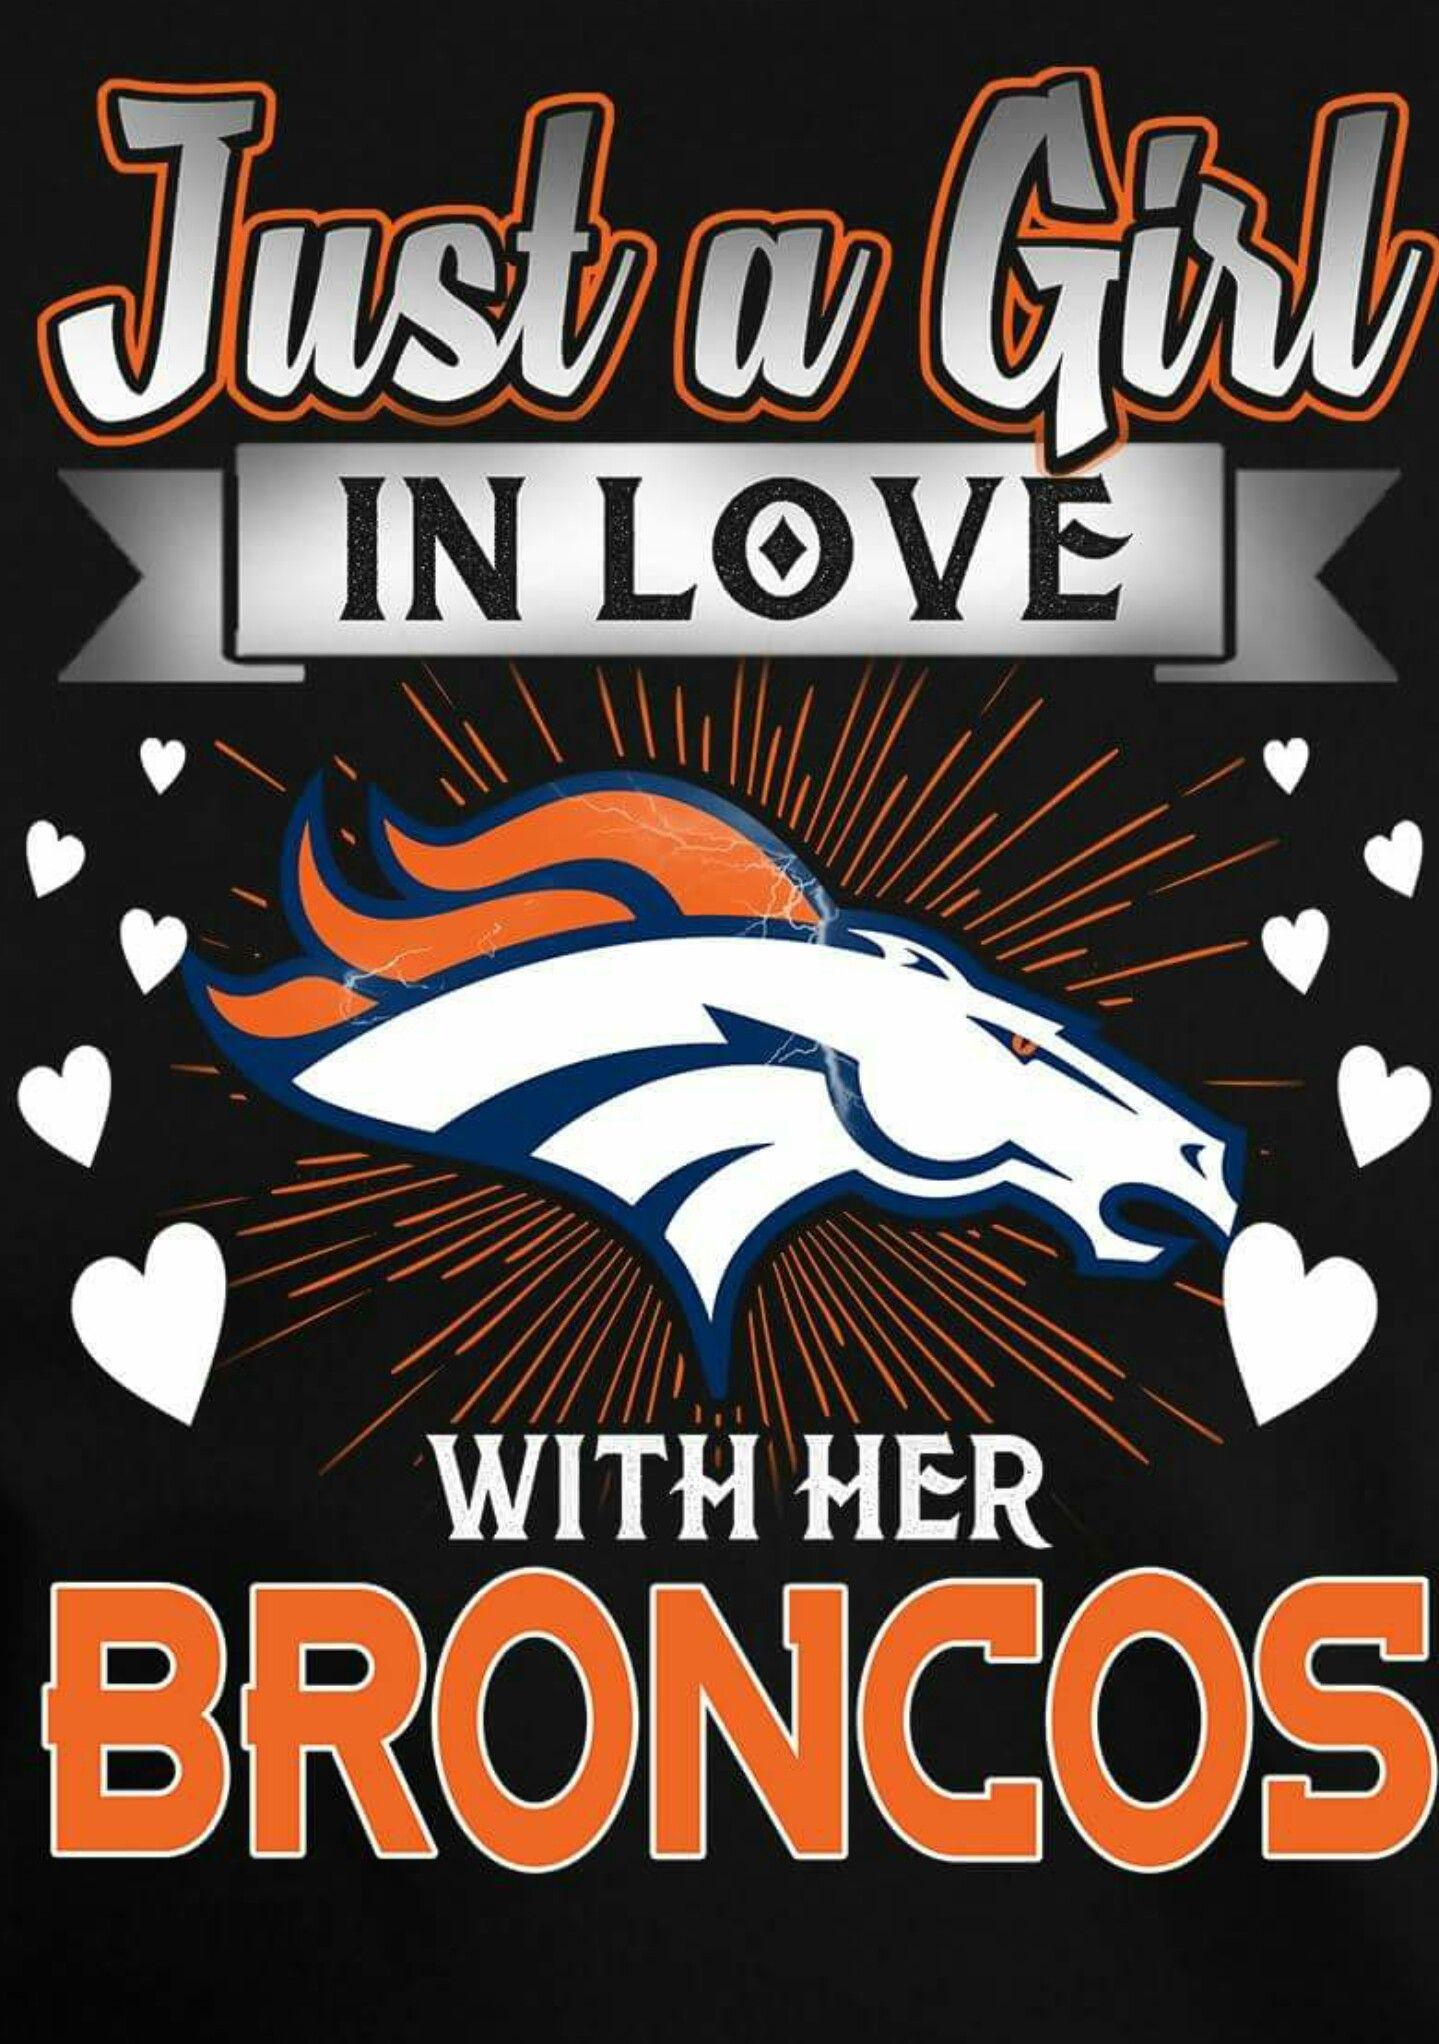 I love Broncos Denver broncos, Broncos, Denver broncos